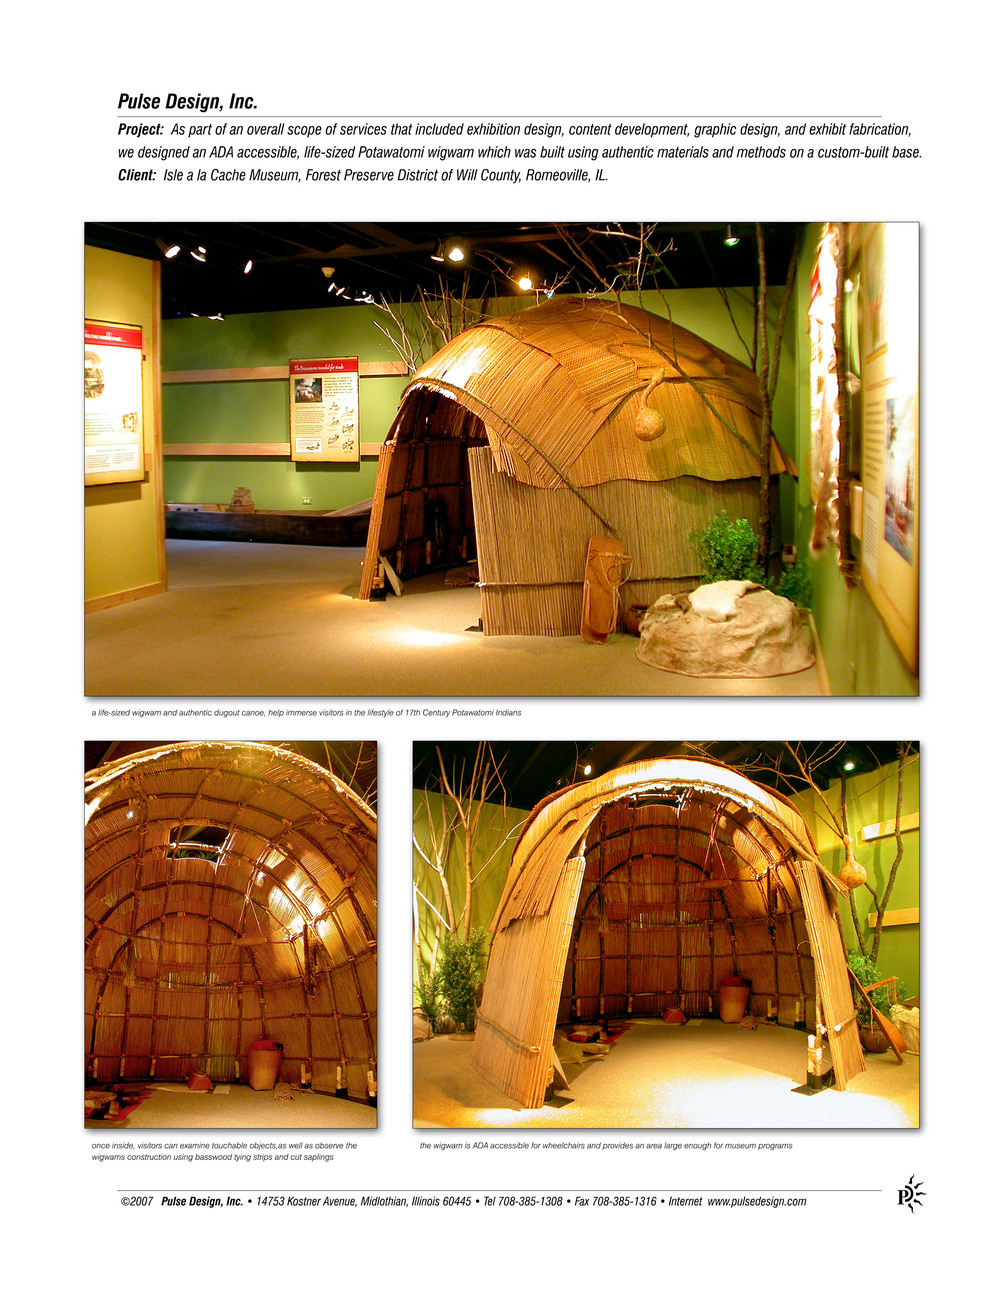 Isla-a-la-Cache-Exhibit-Wigwam-Pulse-Design-Inc.jpg